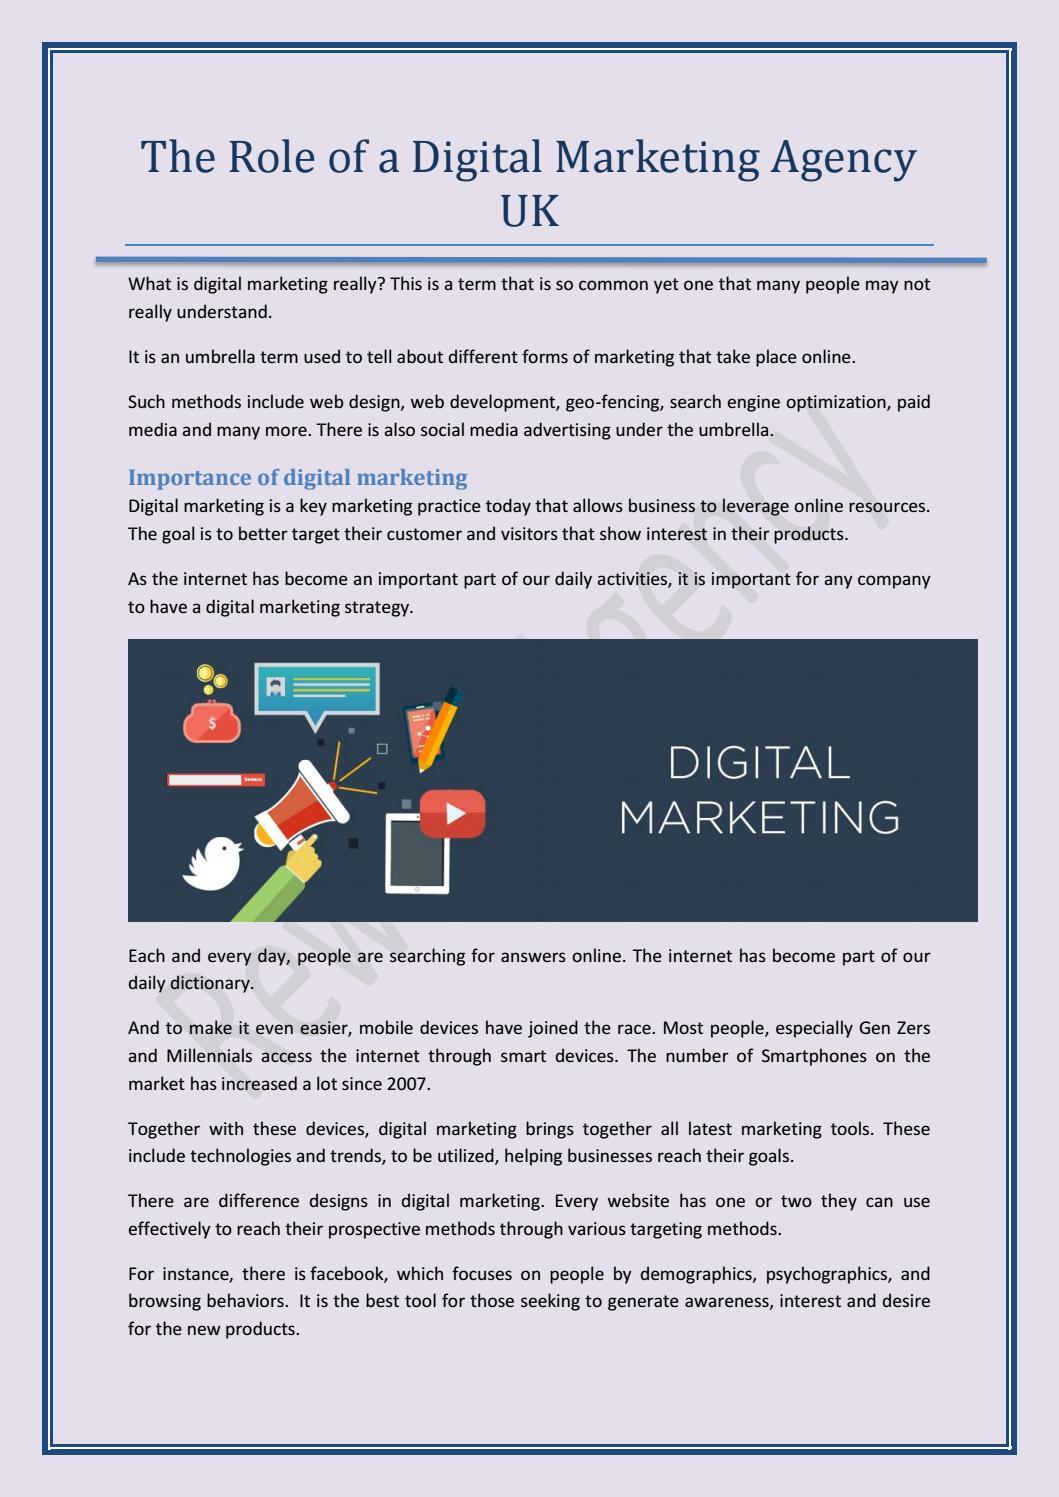 The Role of a Digital Marketing Agency UK by rewardmarketing